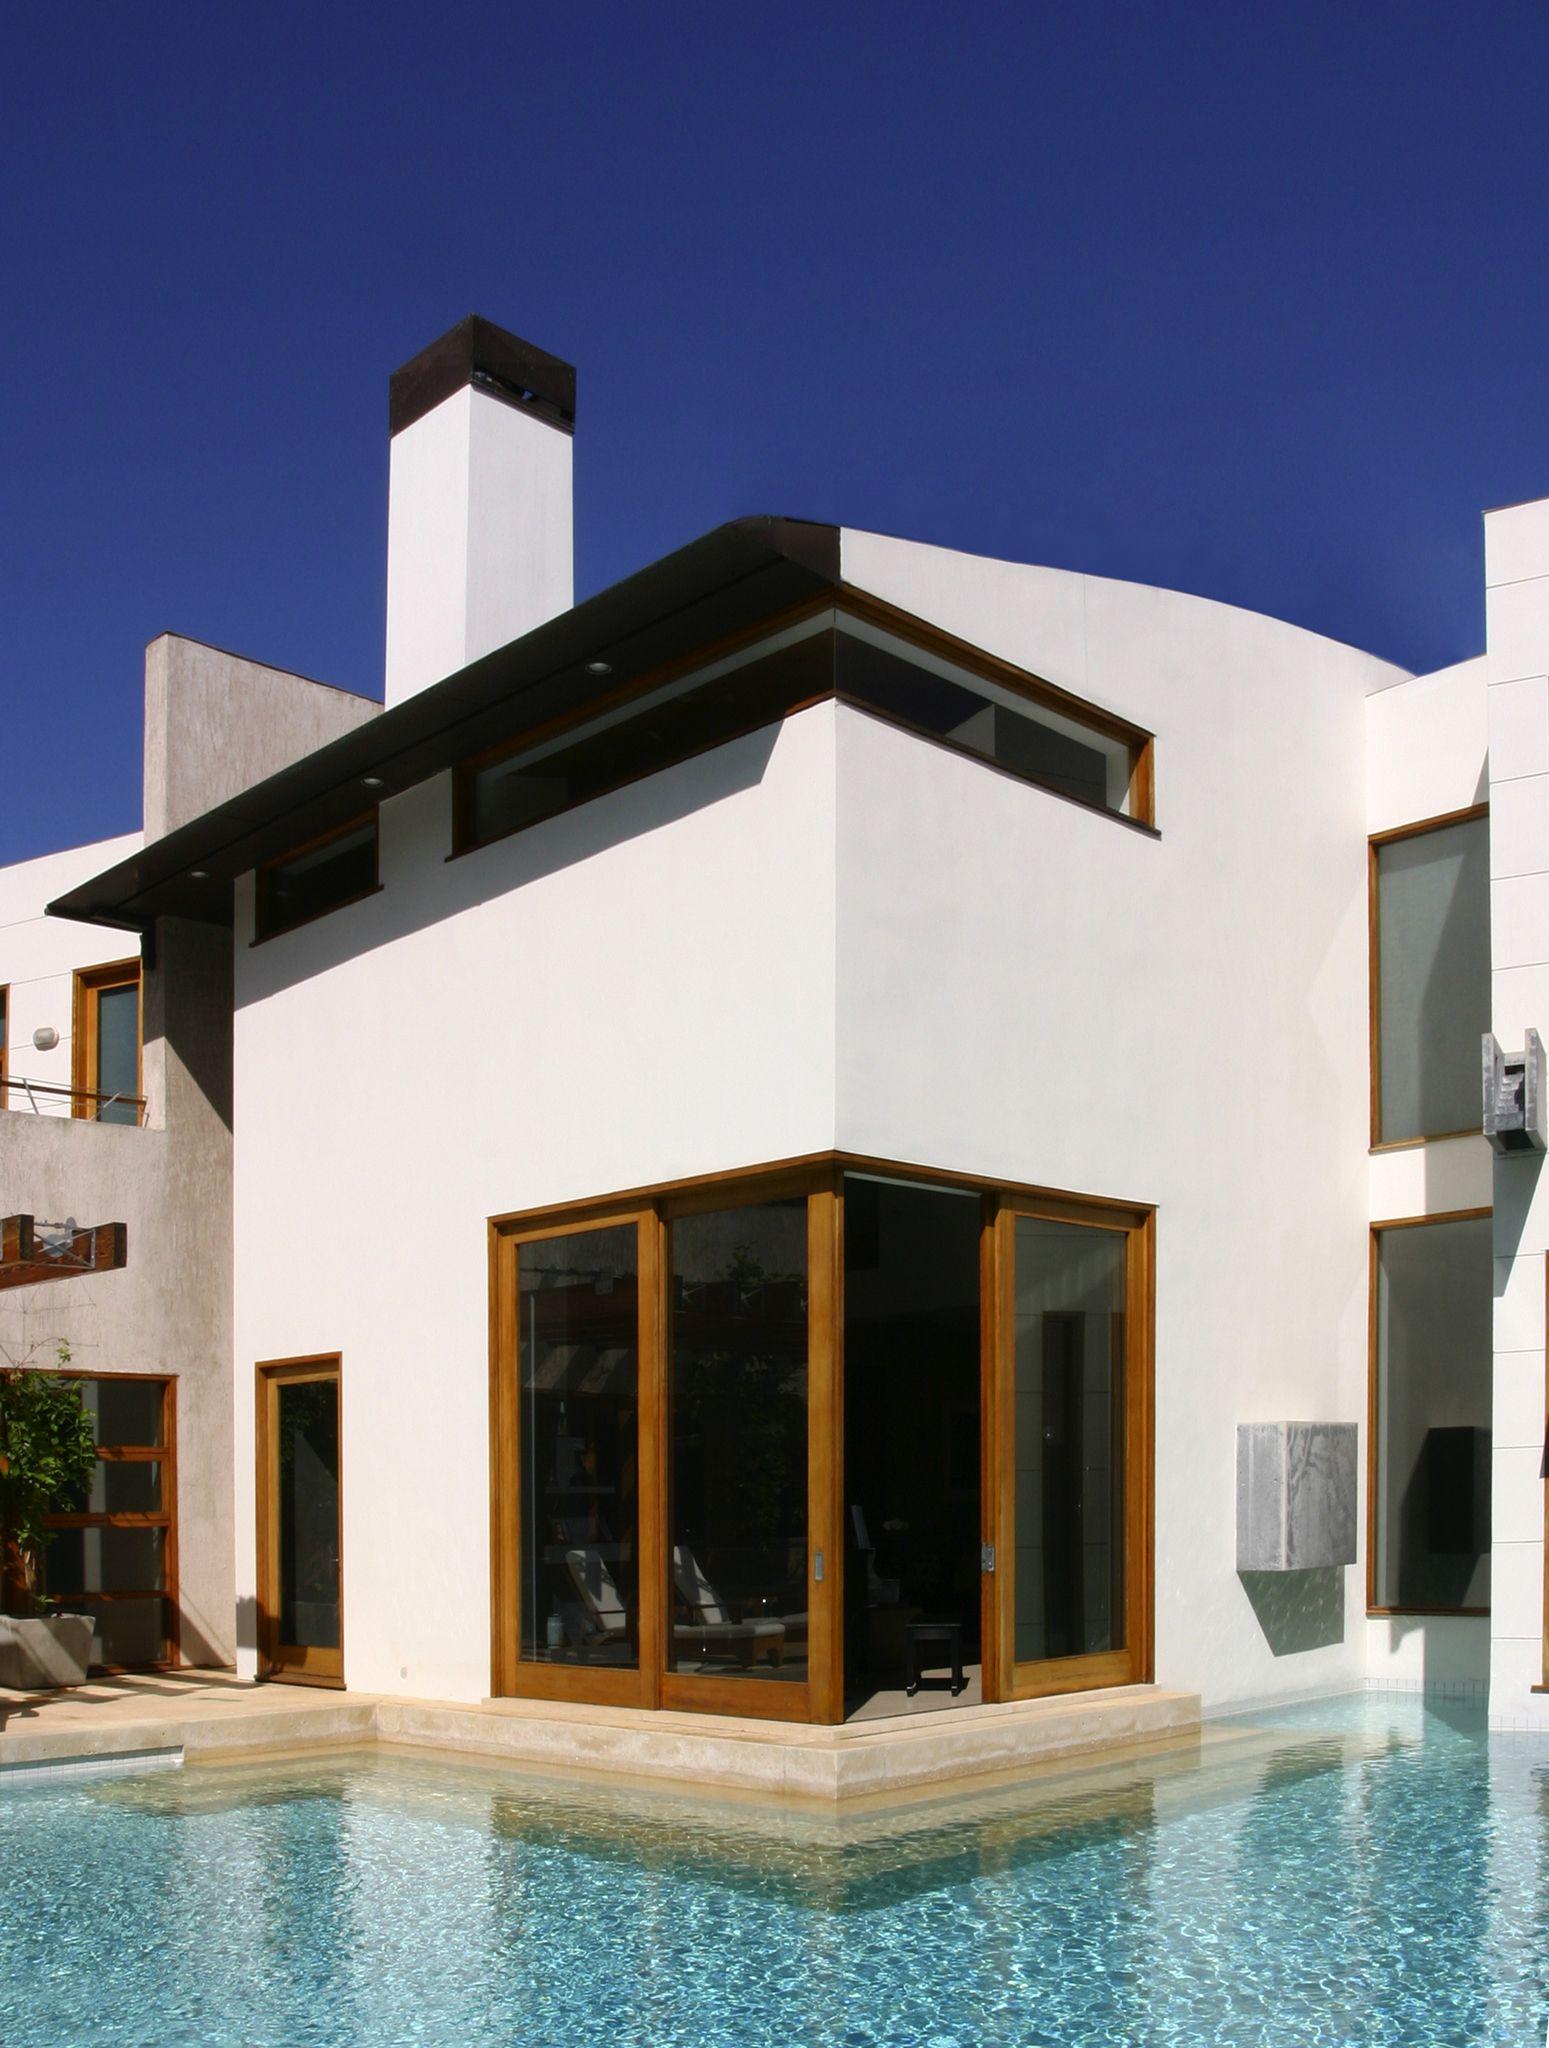 Pool designed by Abramson Tieger Architects. www.abramsonteiger.com